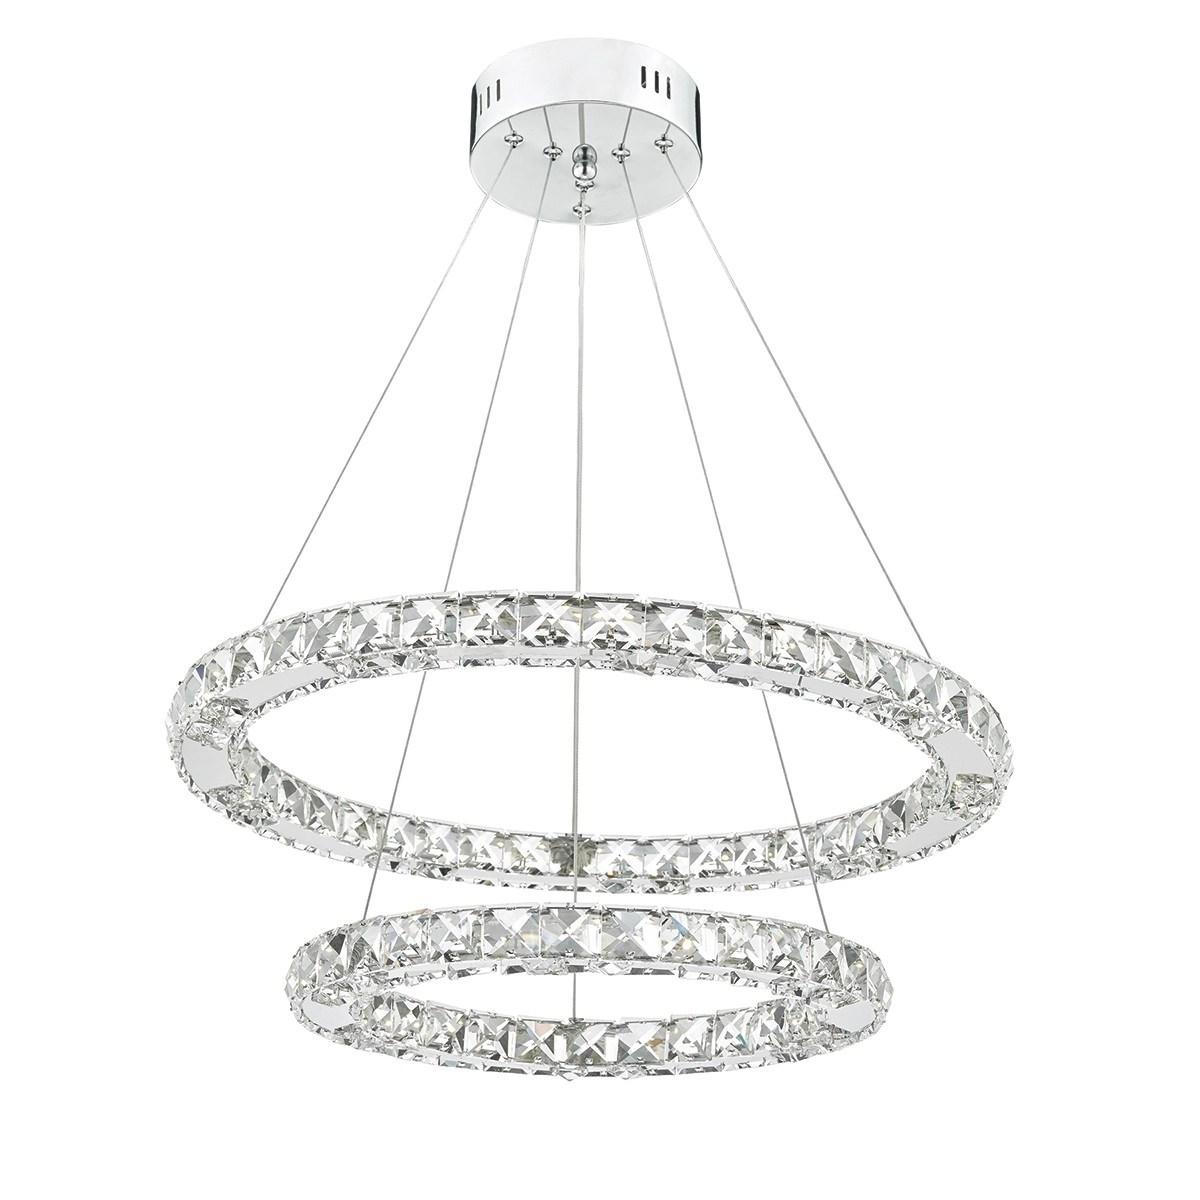 Dar Lighting Roma Led Pendant Crystal With Chrome Knees